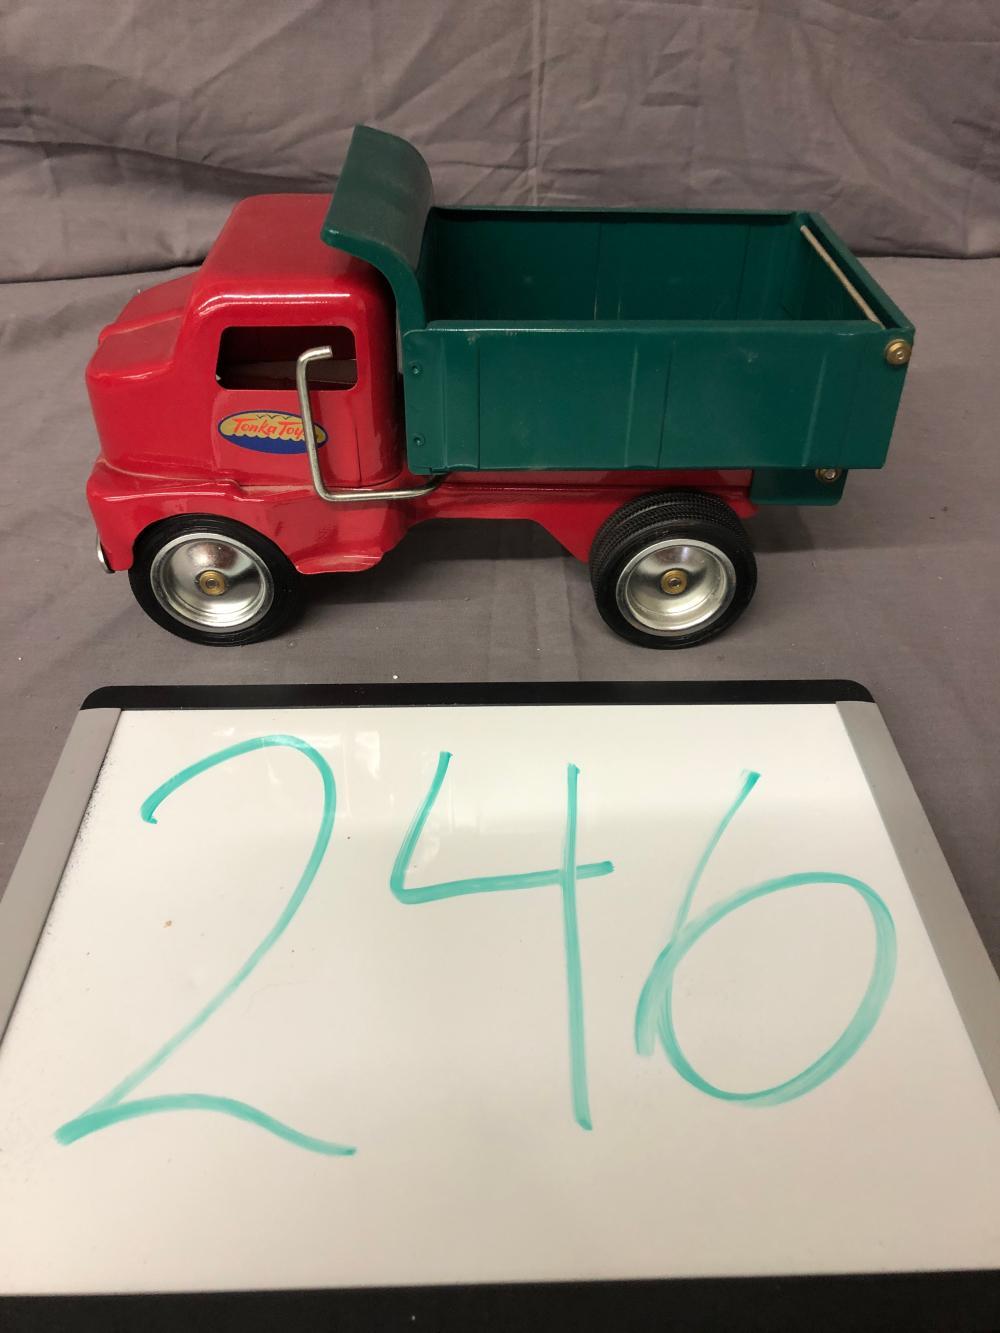 Lot 246: 1996 Tonka Dump Truck